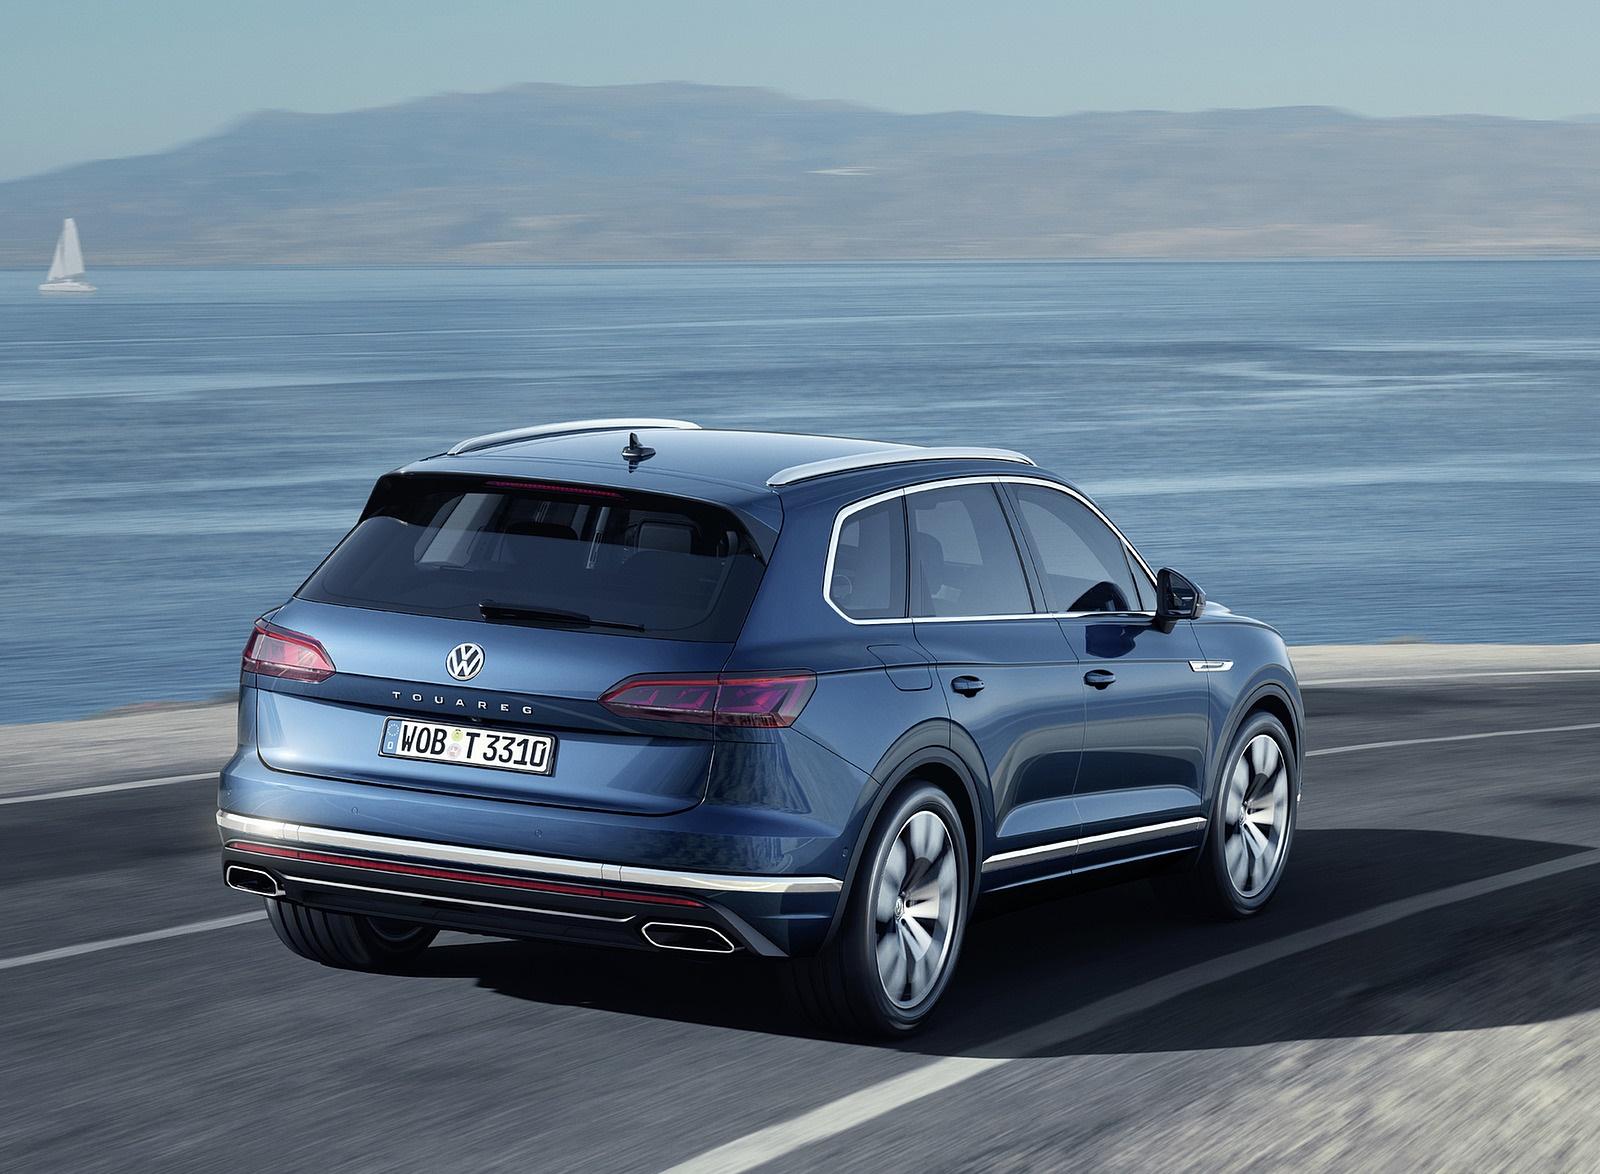 2019 Volkswagen Touareg Rear Wallpapers (14)